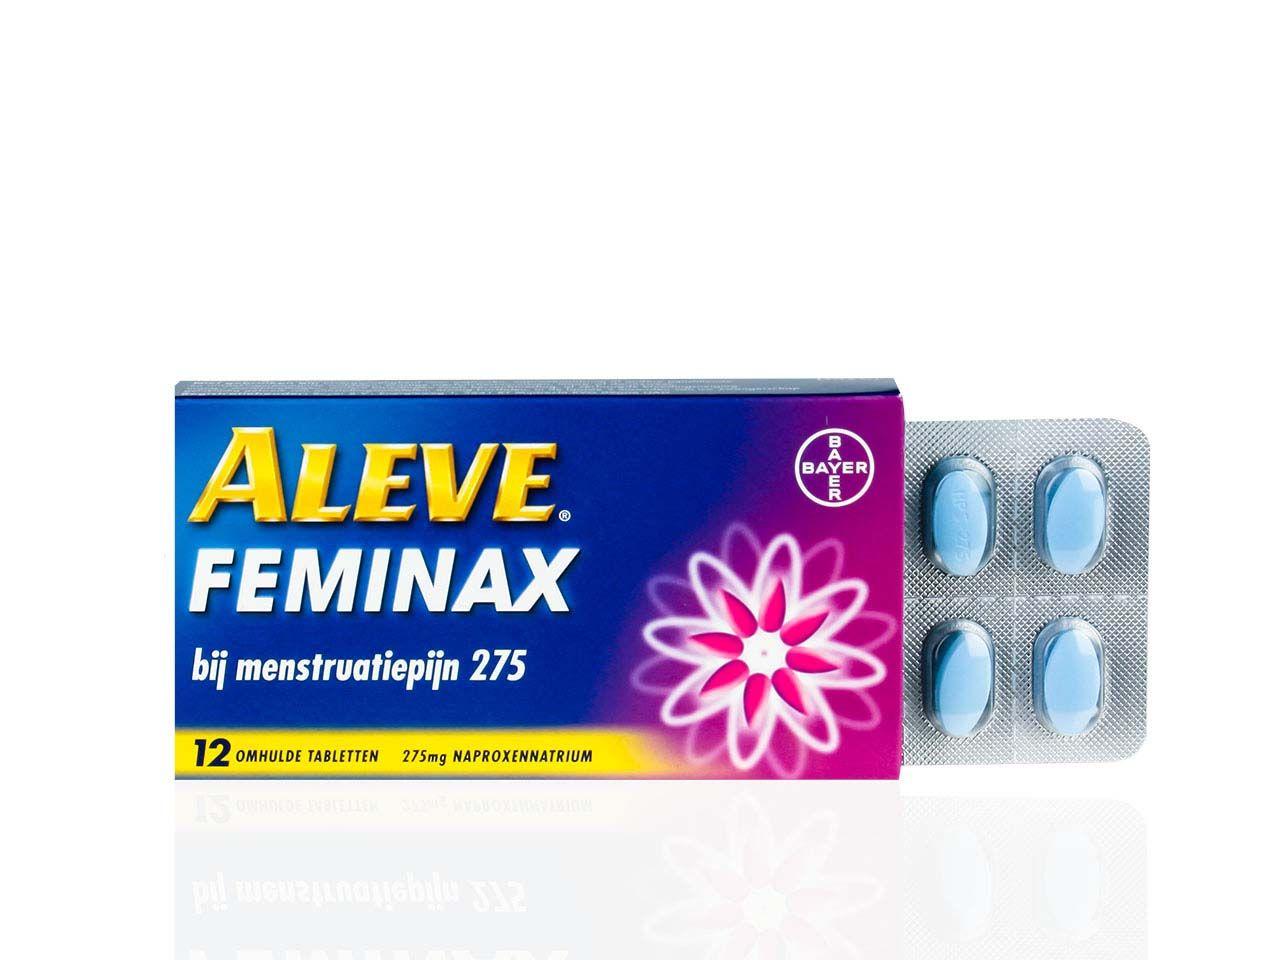 Aleve Feminax Tablet 275mg